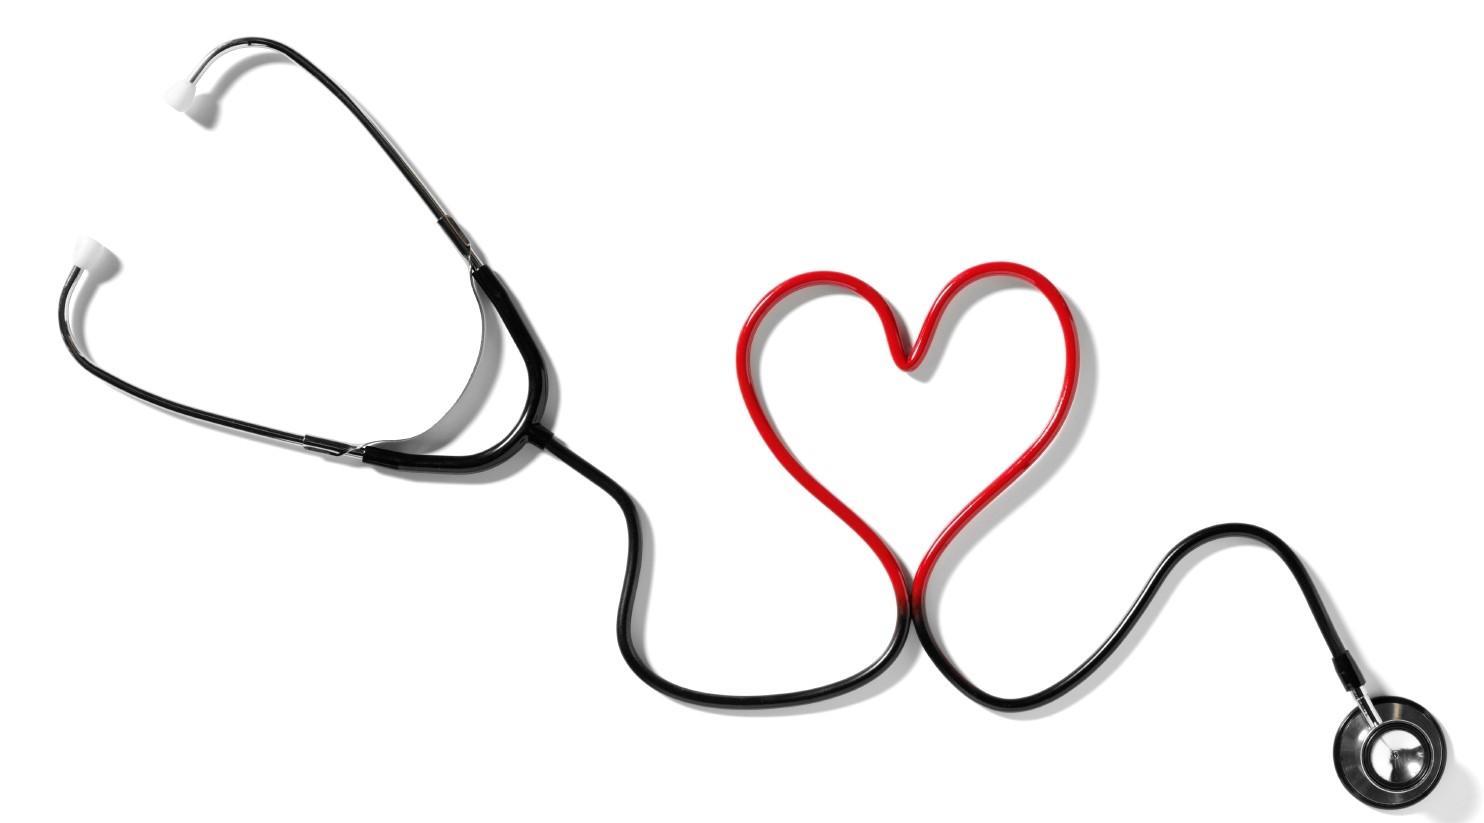 Healthcare clipart healthcare system, Healthcare healthcare.